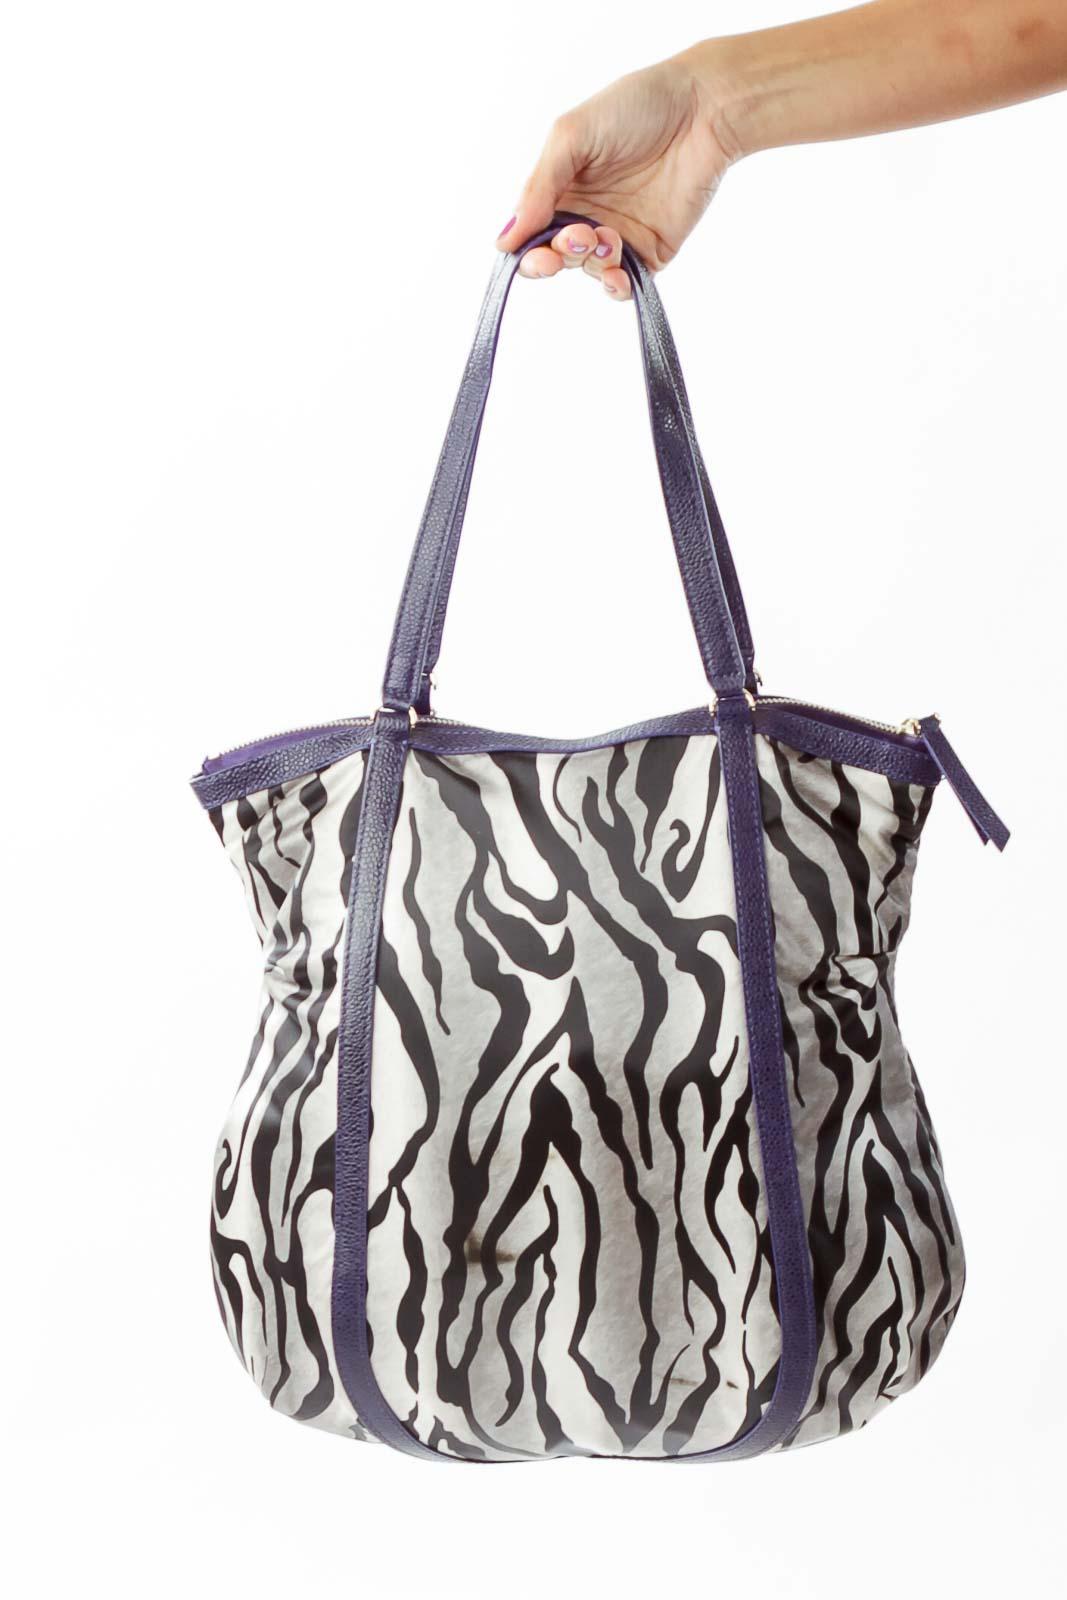 Purple Black Zebra Print Tote Front